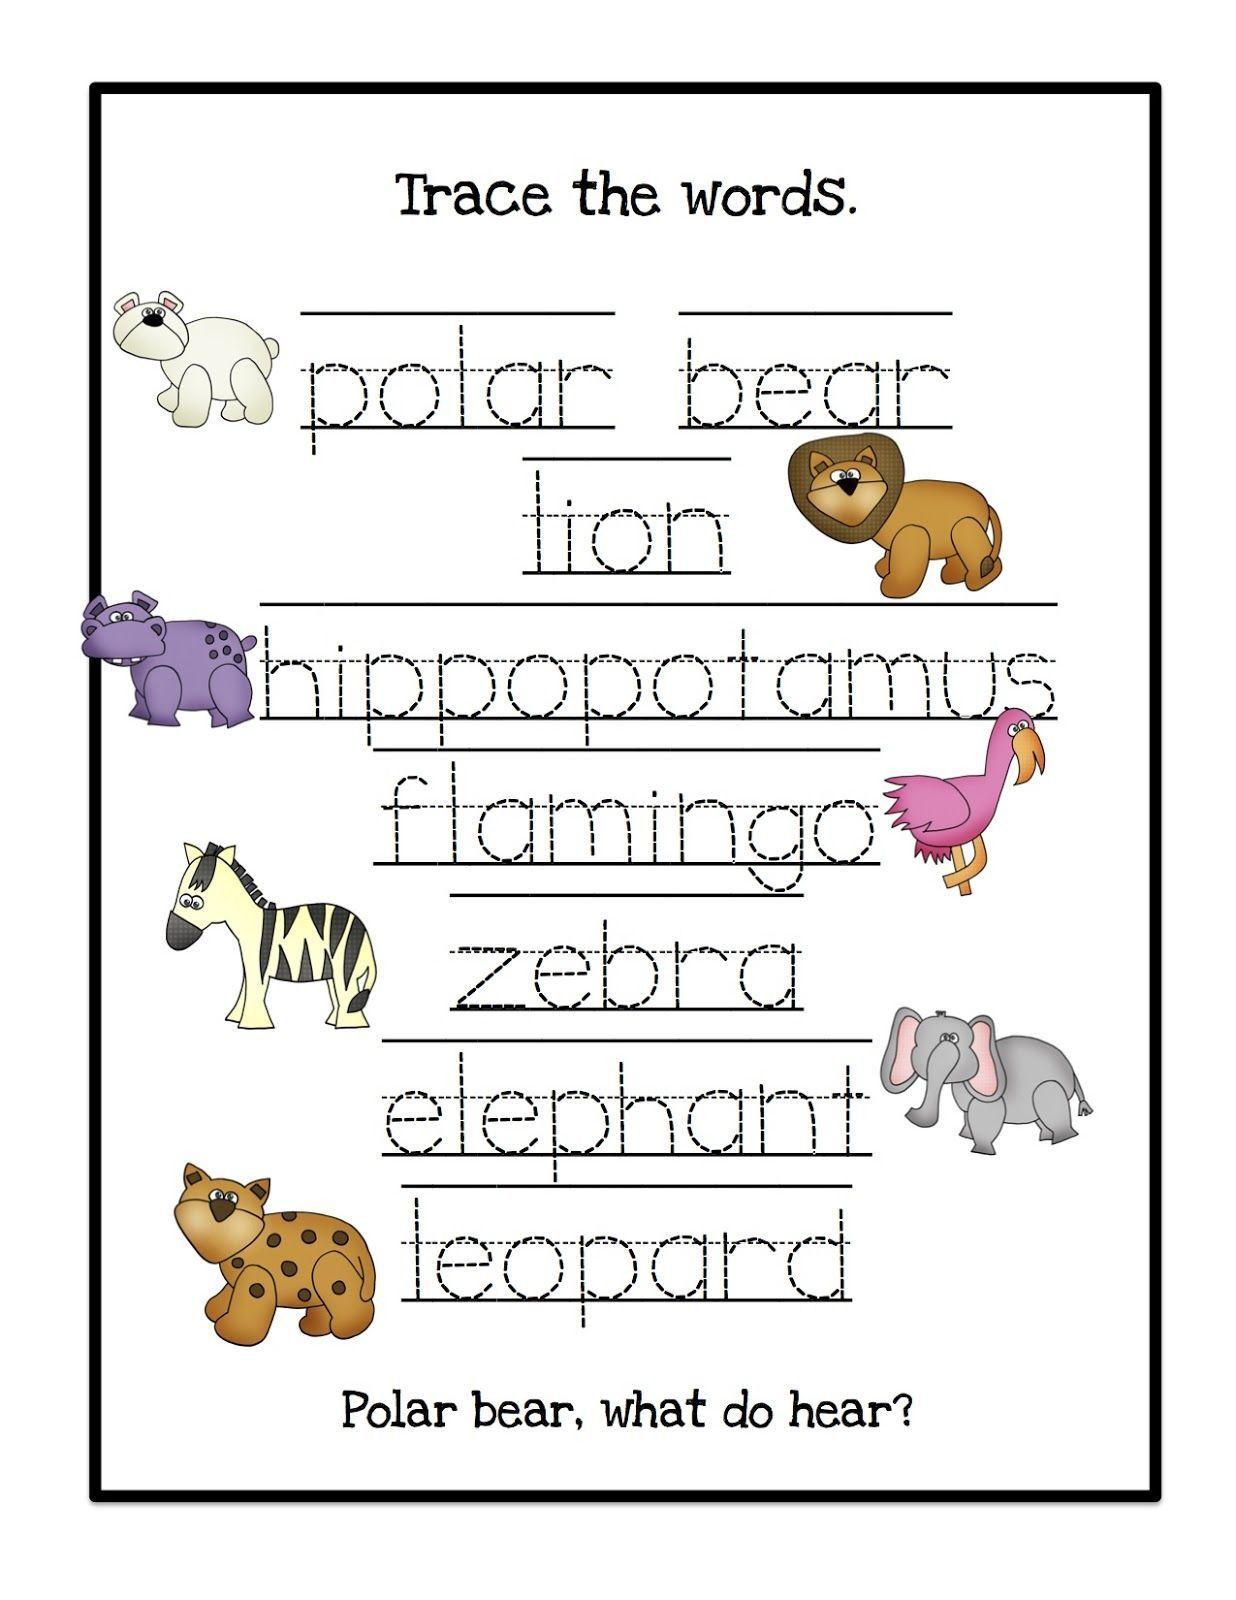 Polar Bear Worksheets Kindergarten In 2021 Kindergarten Worksheets Preschool Printables Polar Bears Kindergarten [ 1600 x 1236 Pixel ]